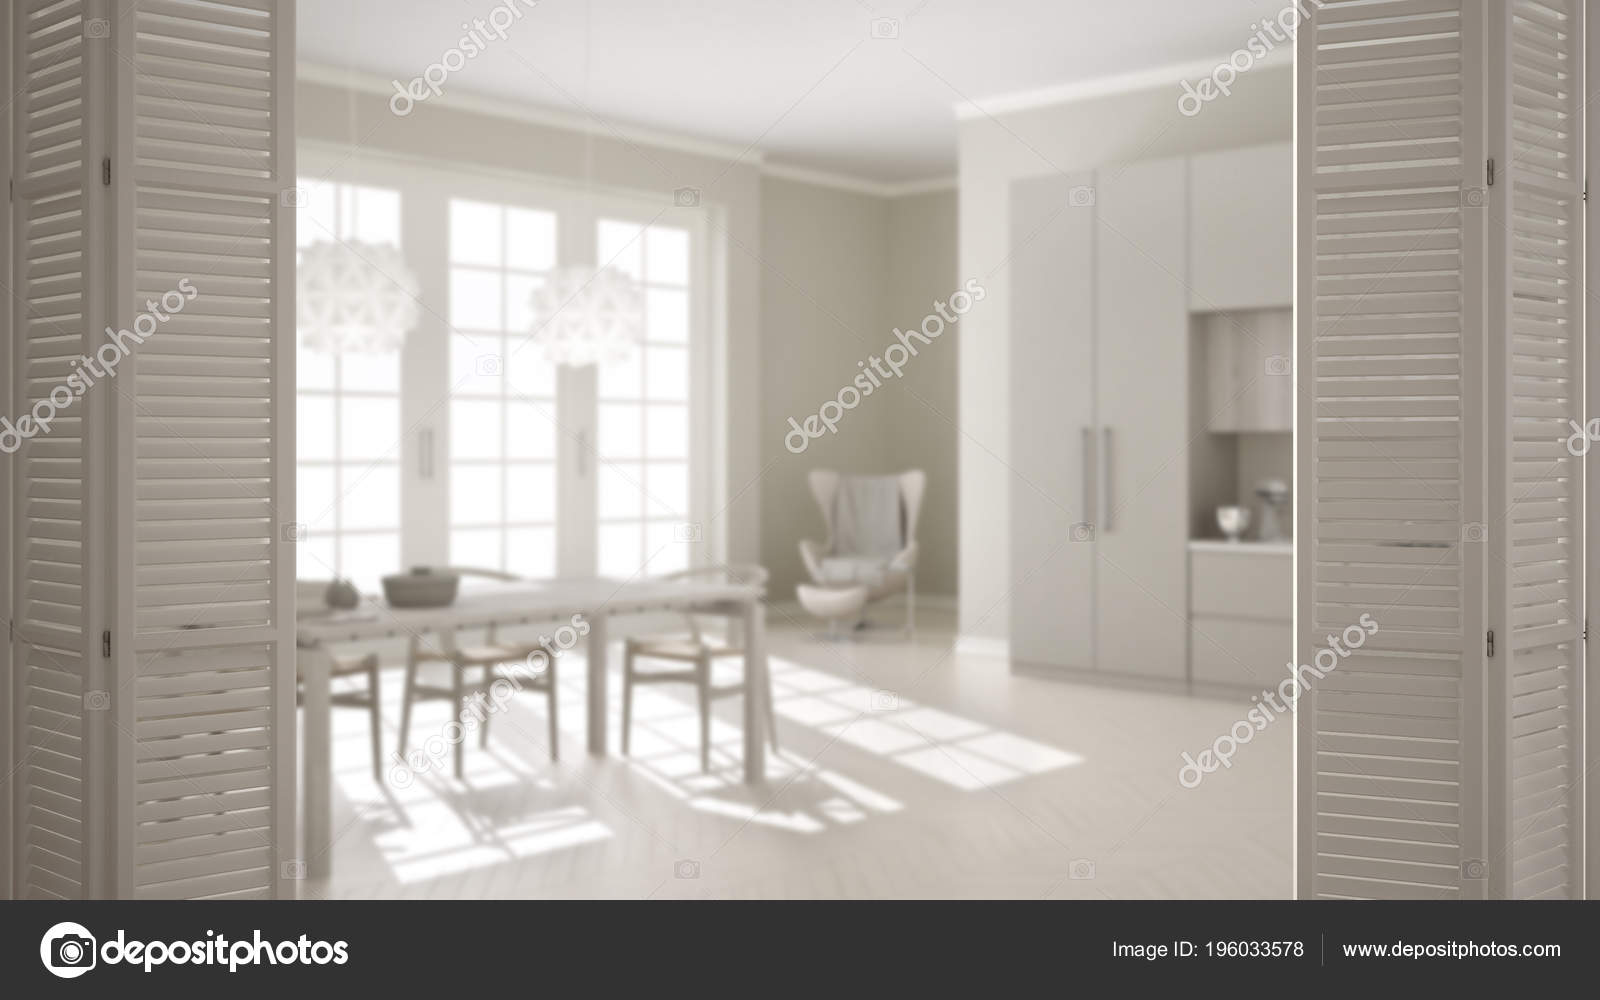 Blanco Puerta Plegable Cocina Clásica Con Mesa Comedor Ventanal ...